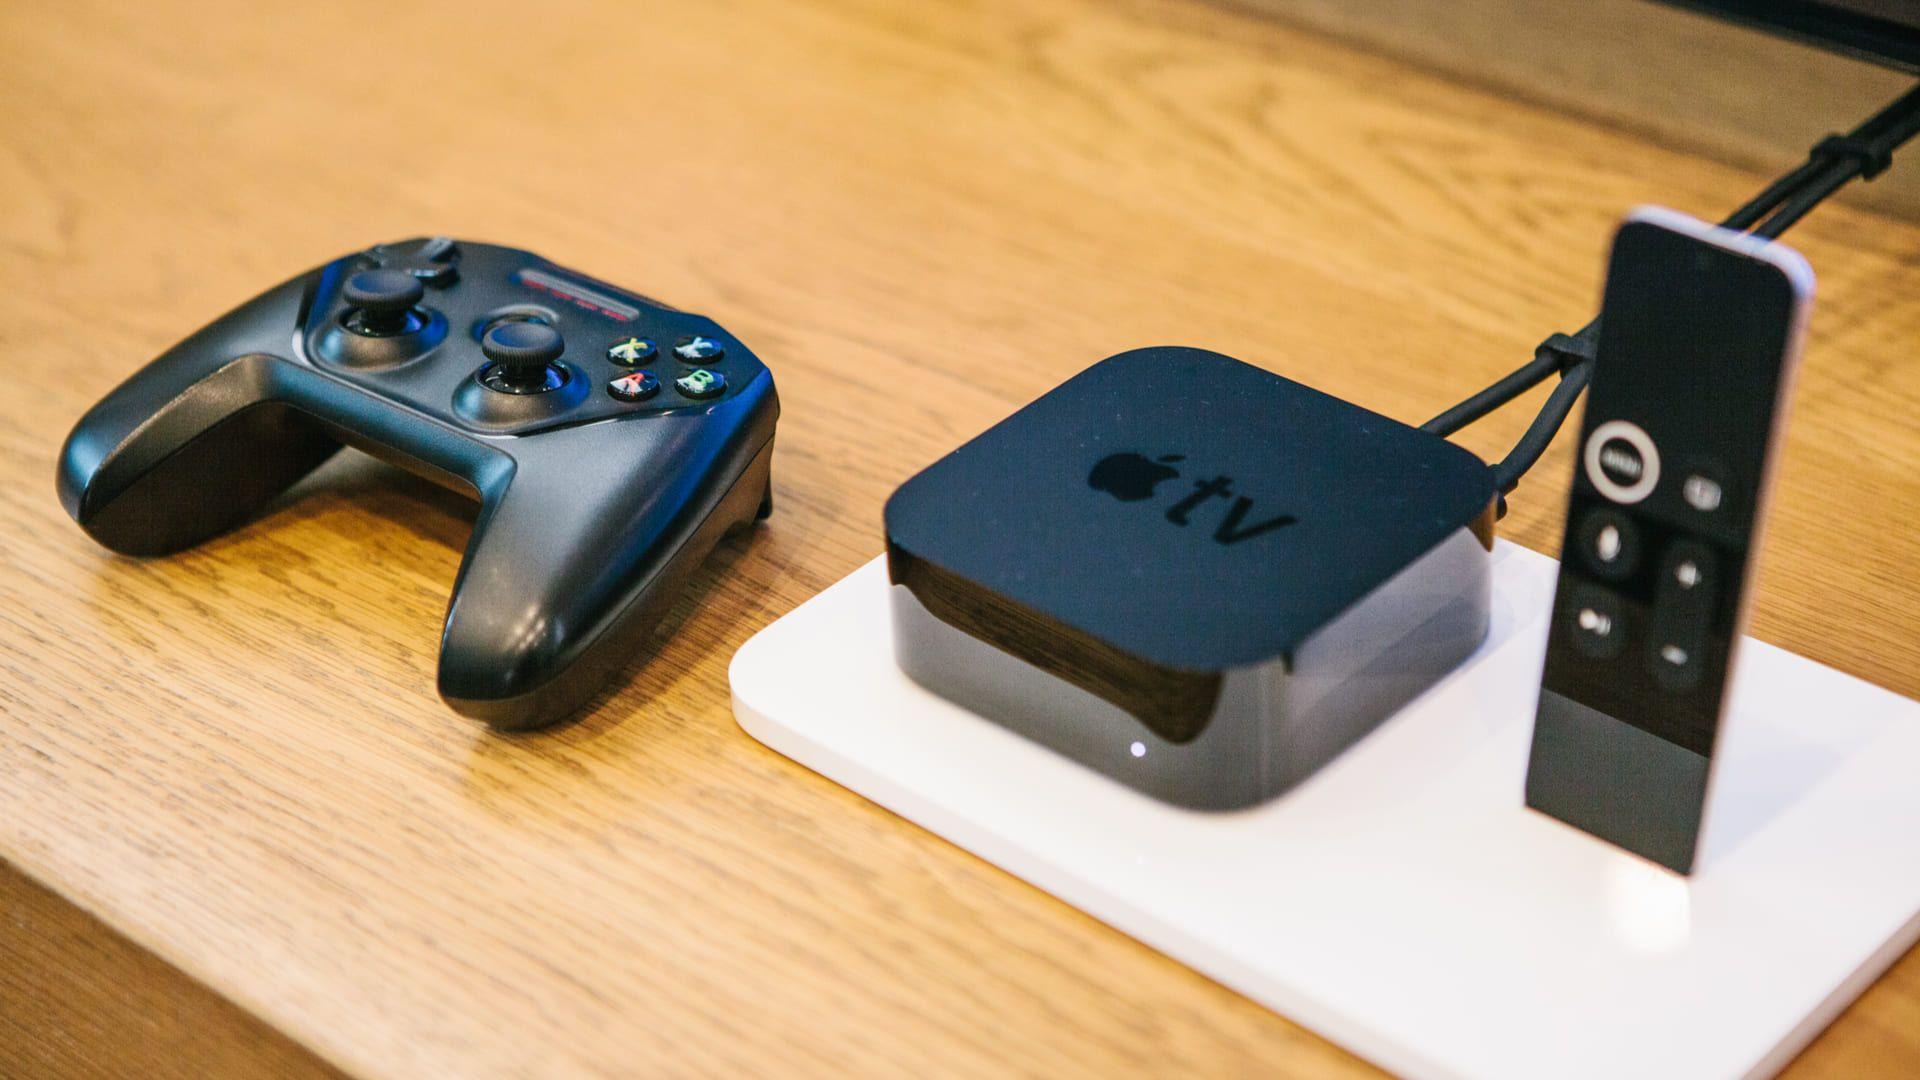 TV box Apple TV e seu controle remoto sobre mesa de madeira